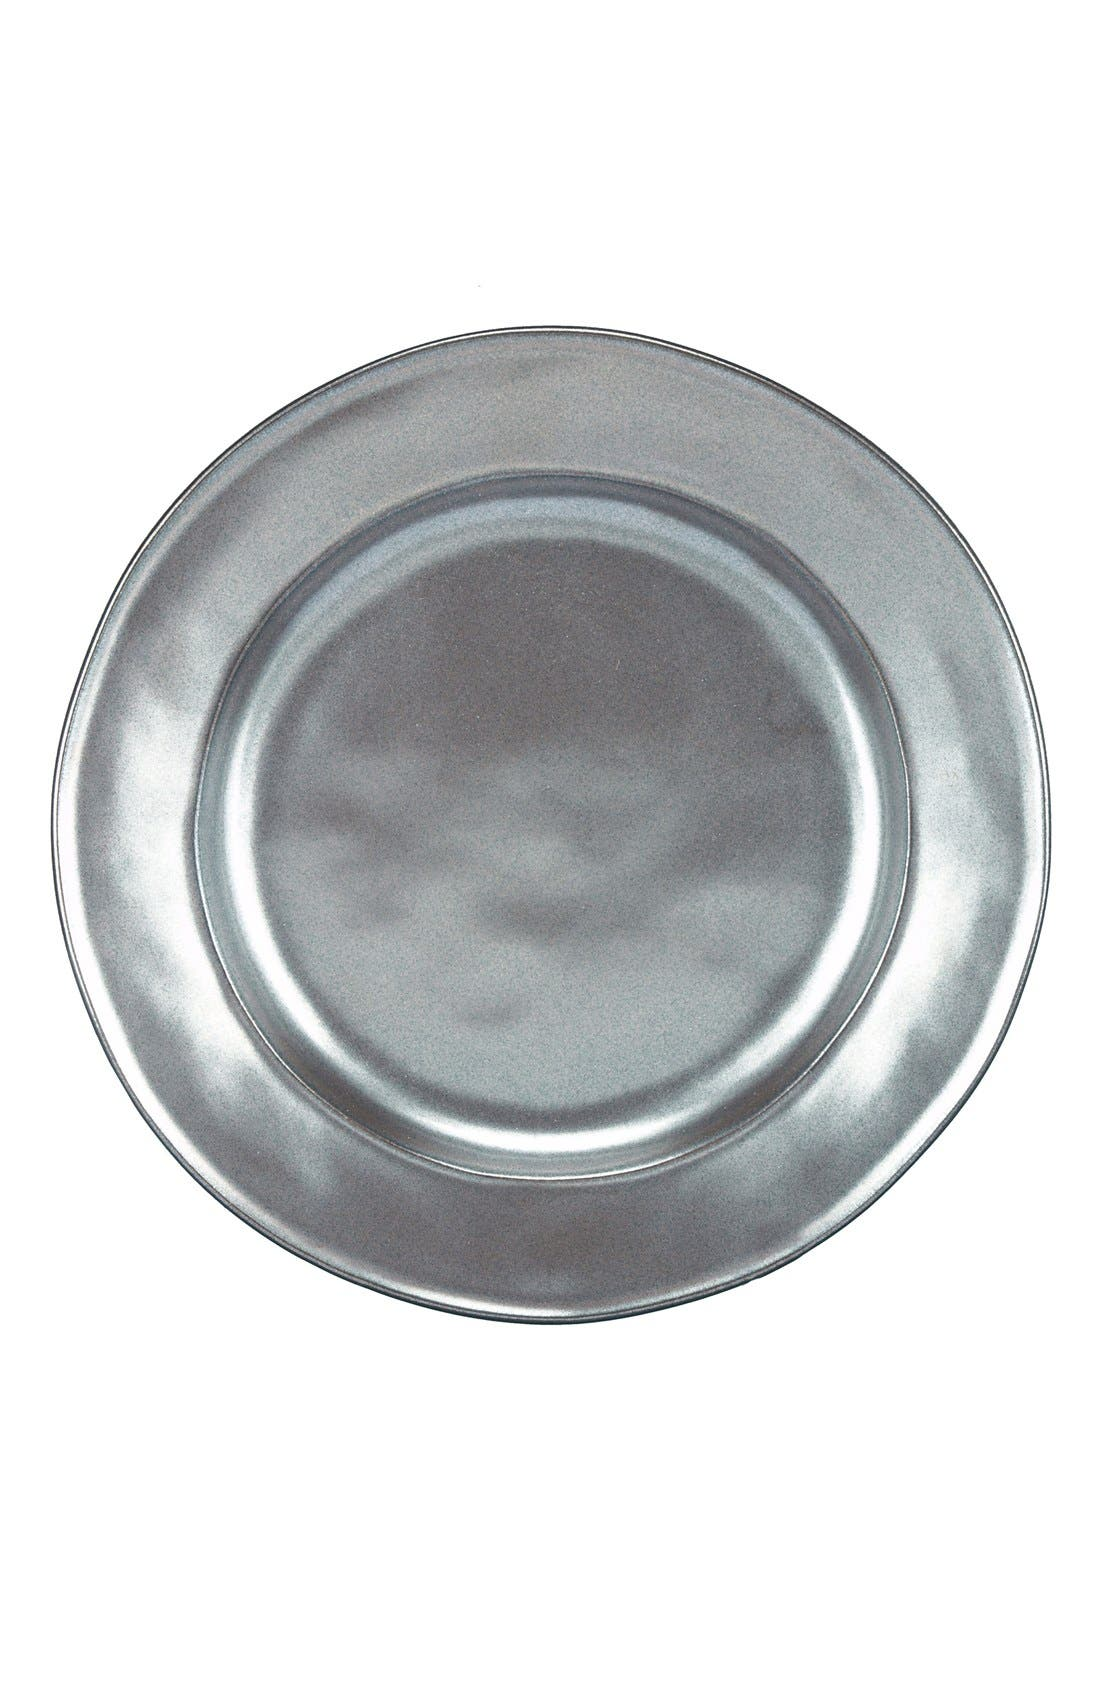 JULISKA 'Pewter' Ceramic Salad Plate